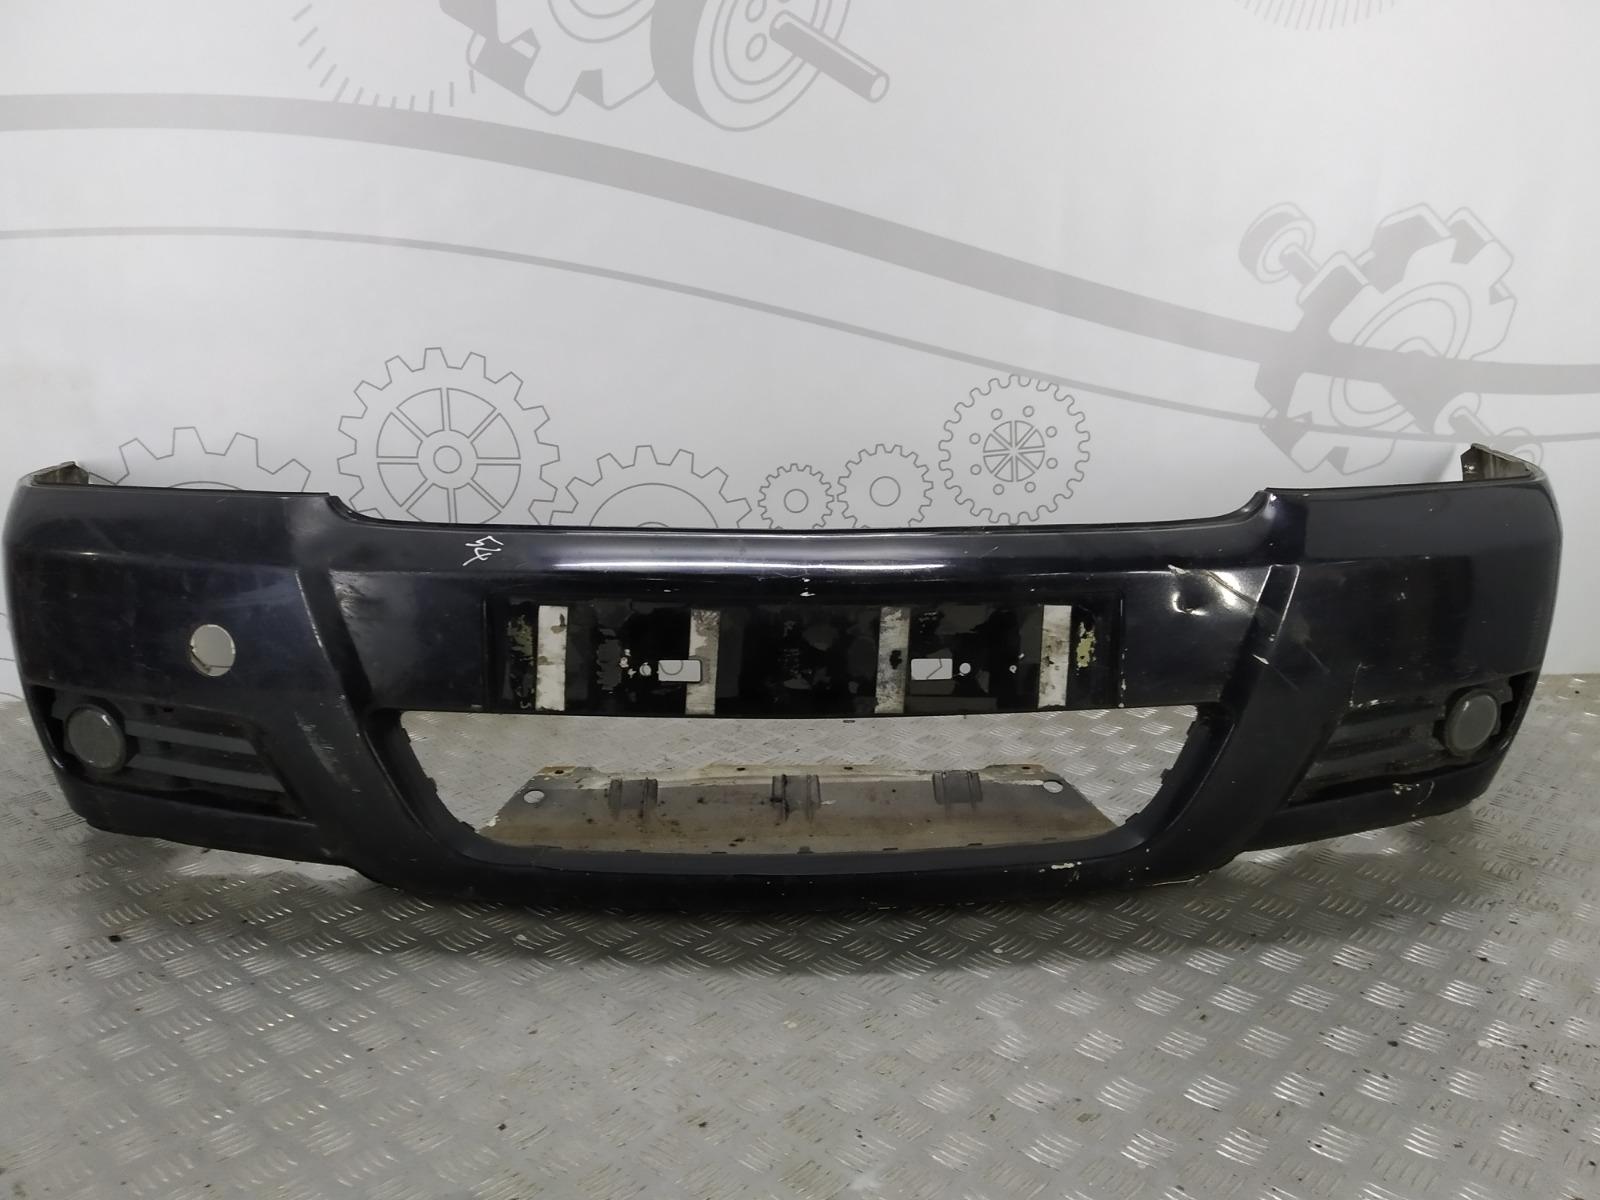 Бампер передний Opel Vectra C 1.9 CDTI 2005 (б/у)